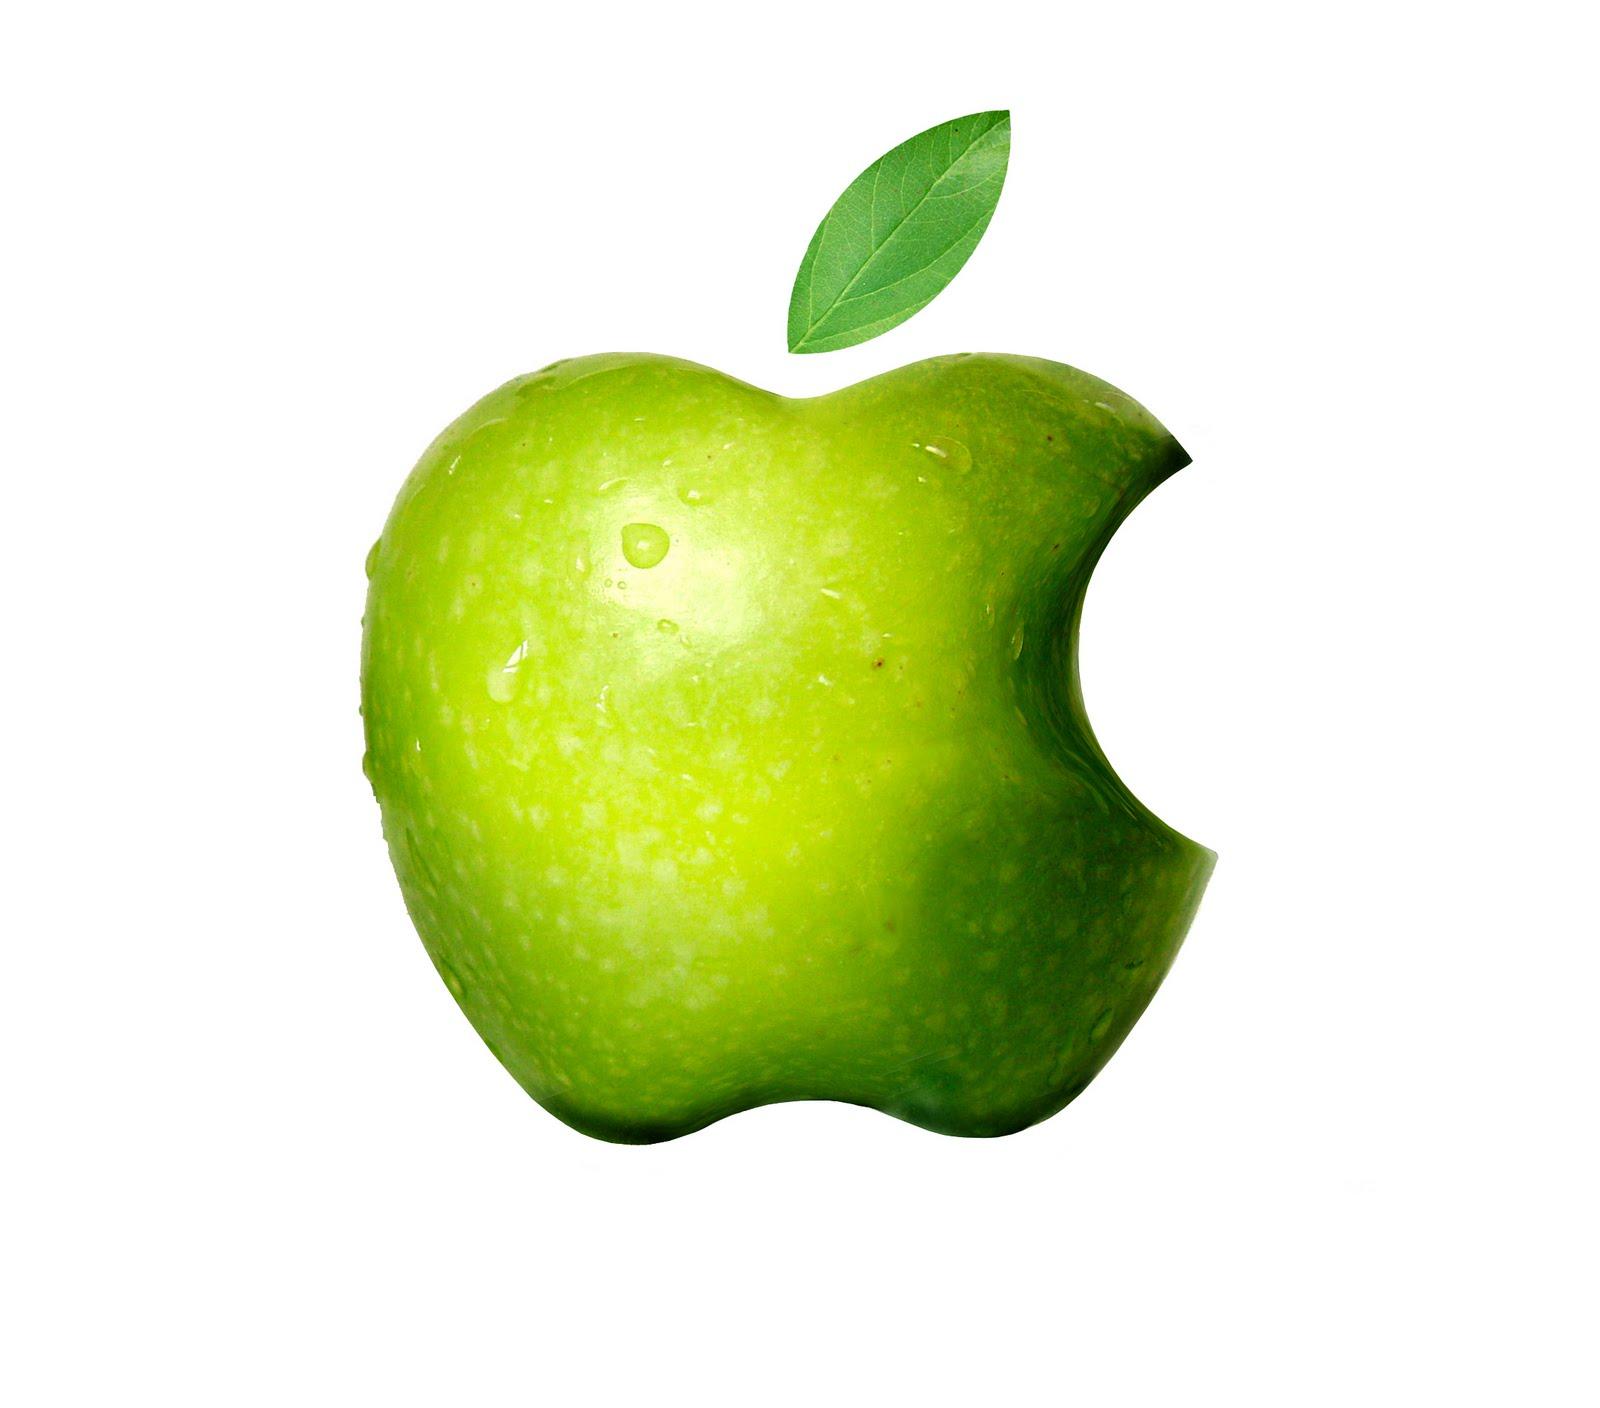 http://blog.colourstudio.com/2013/08/how-paul-rand-and-ibm-fathered-apple.html